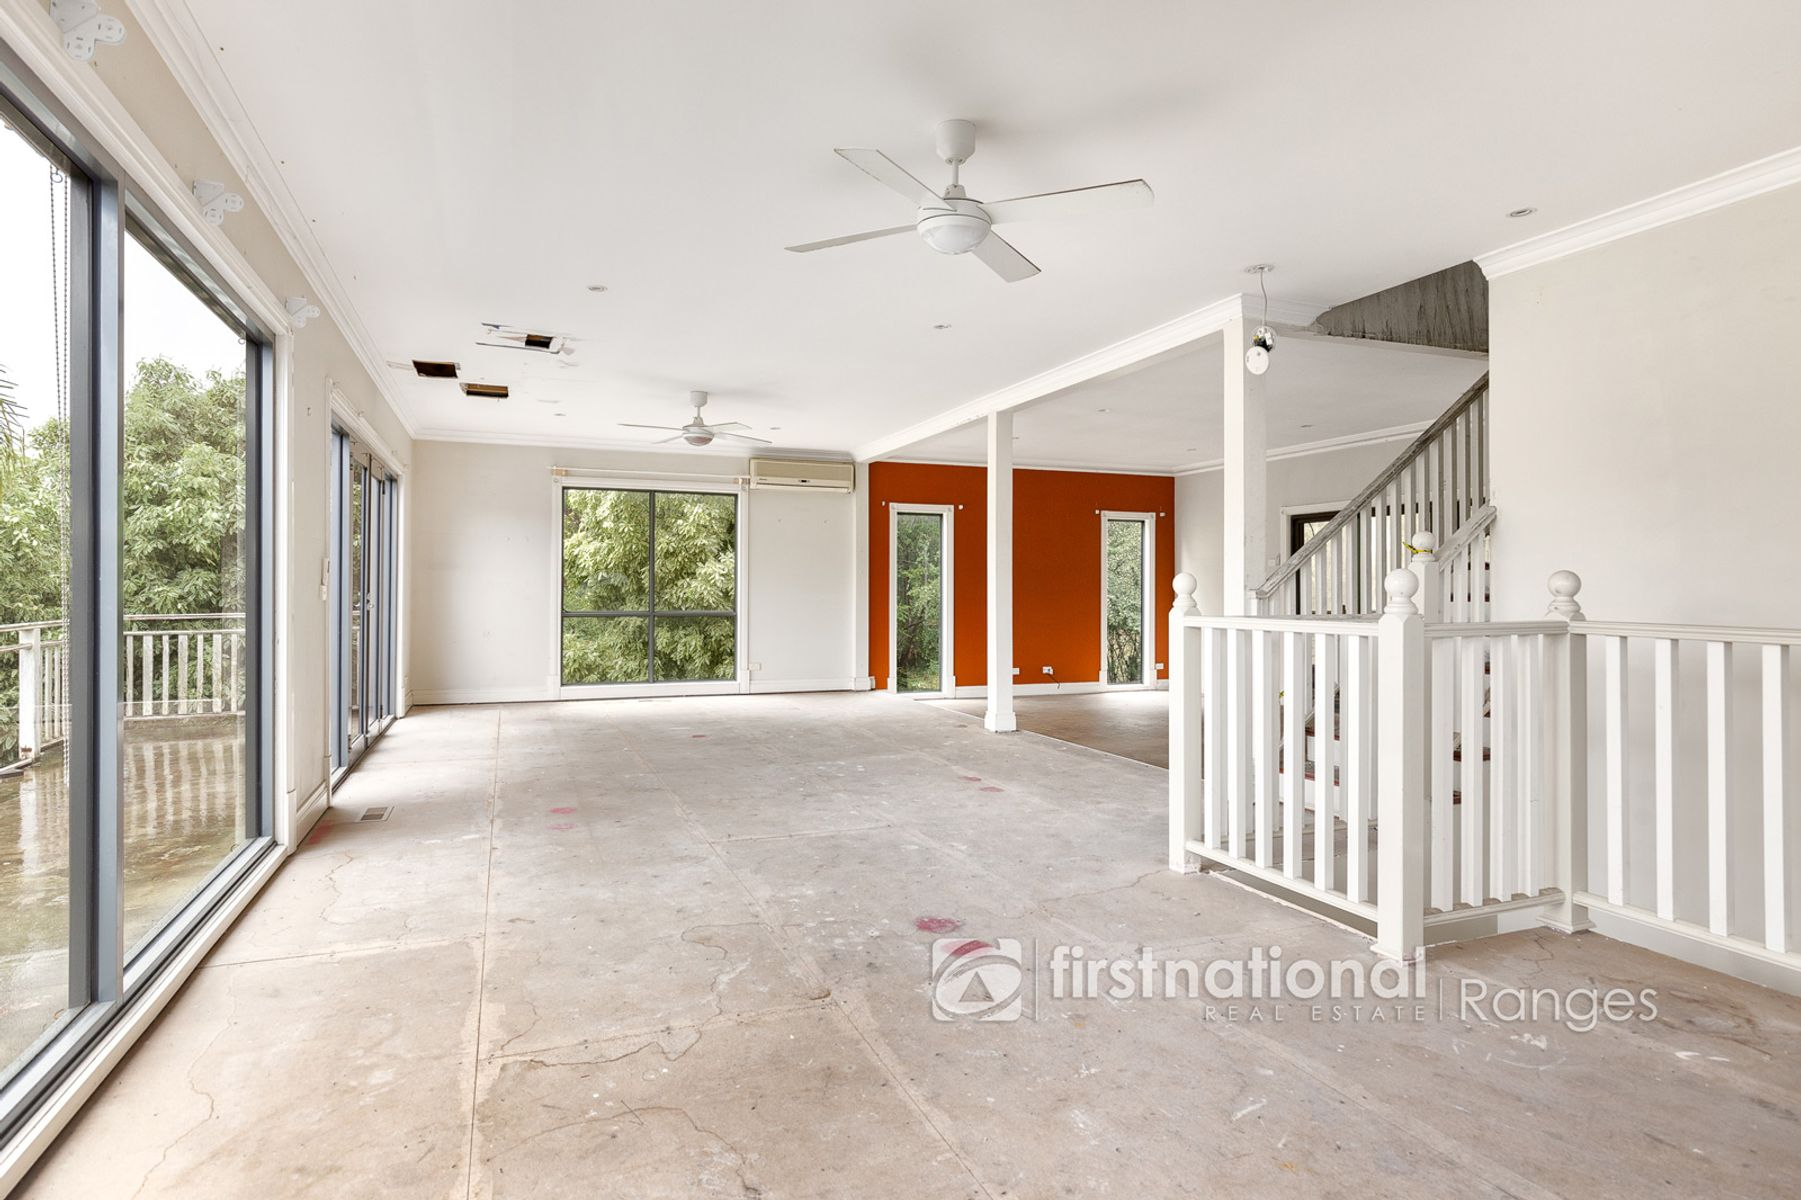 58 Woori Yallock Road, Cockatoo, VIC 3781